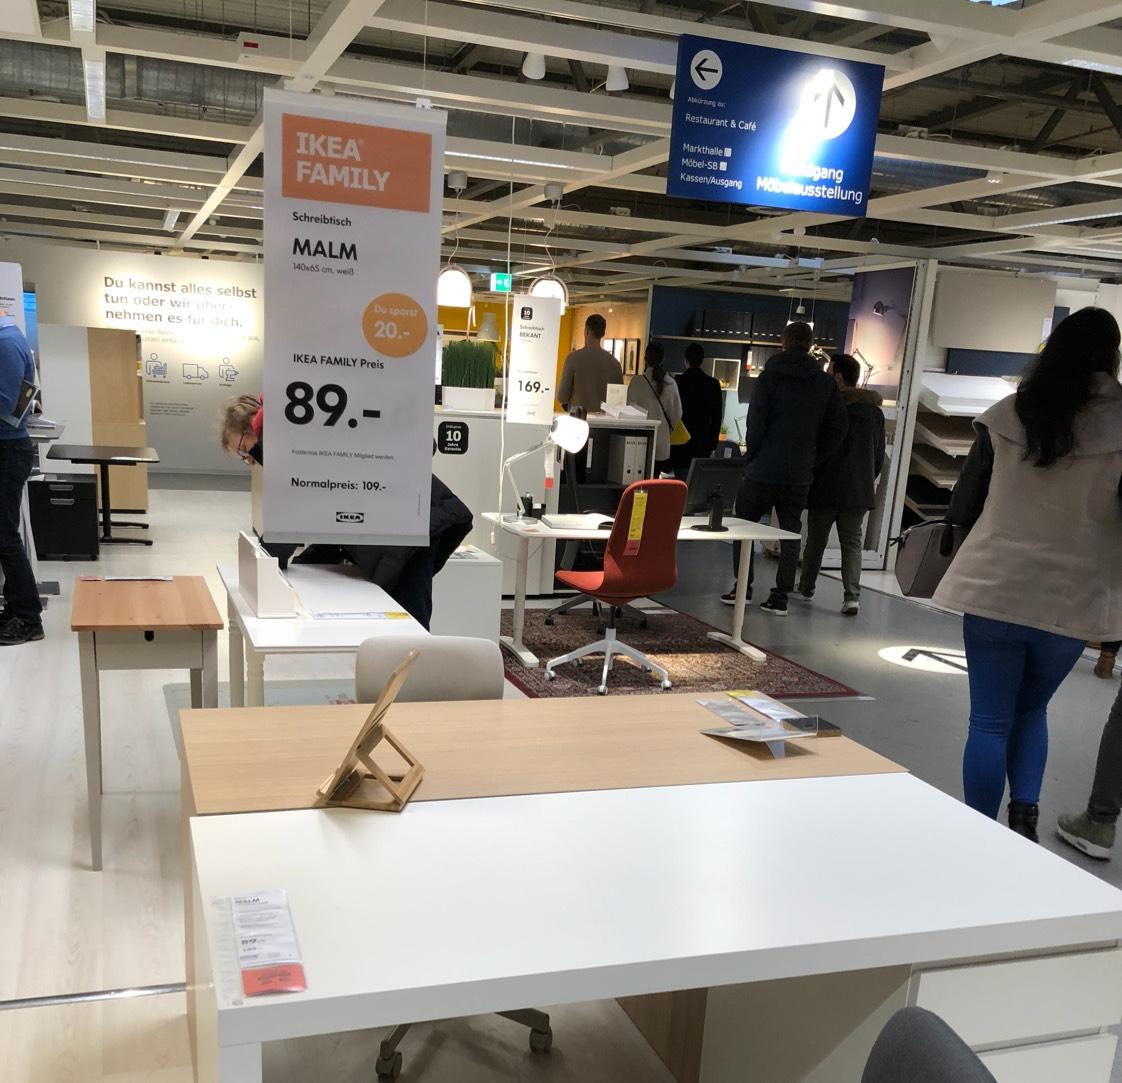 (Ikea Family / Bundesweit) MALM Schreibtisch